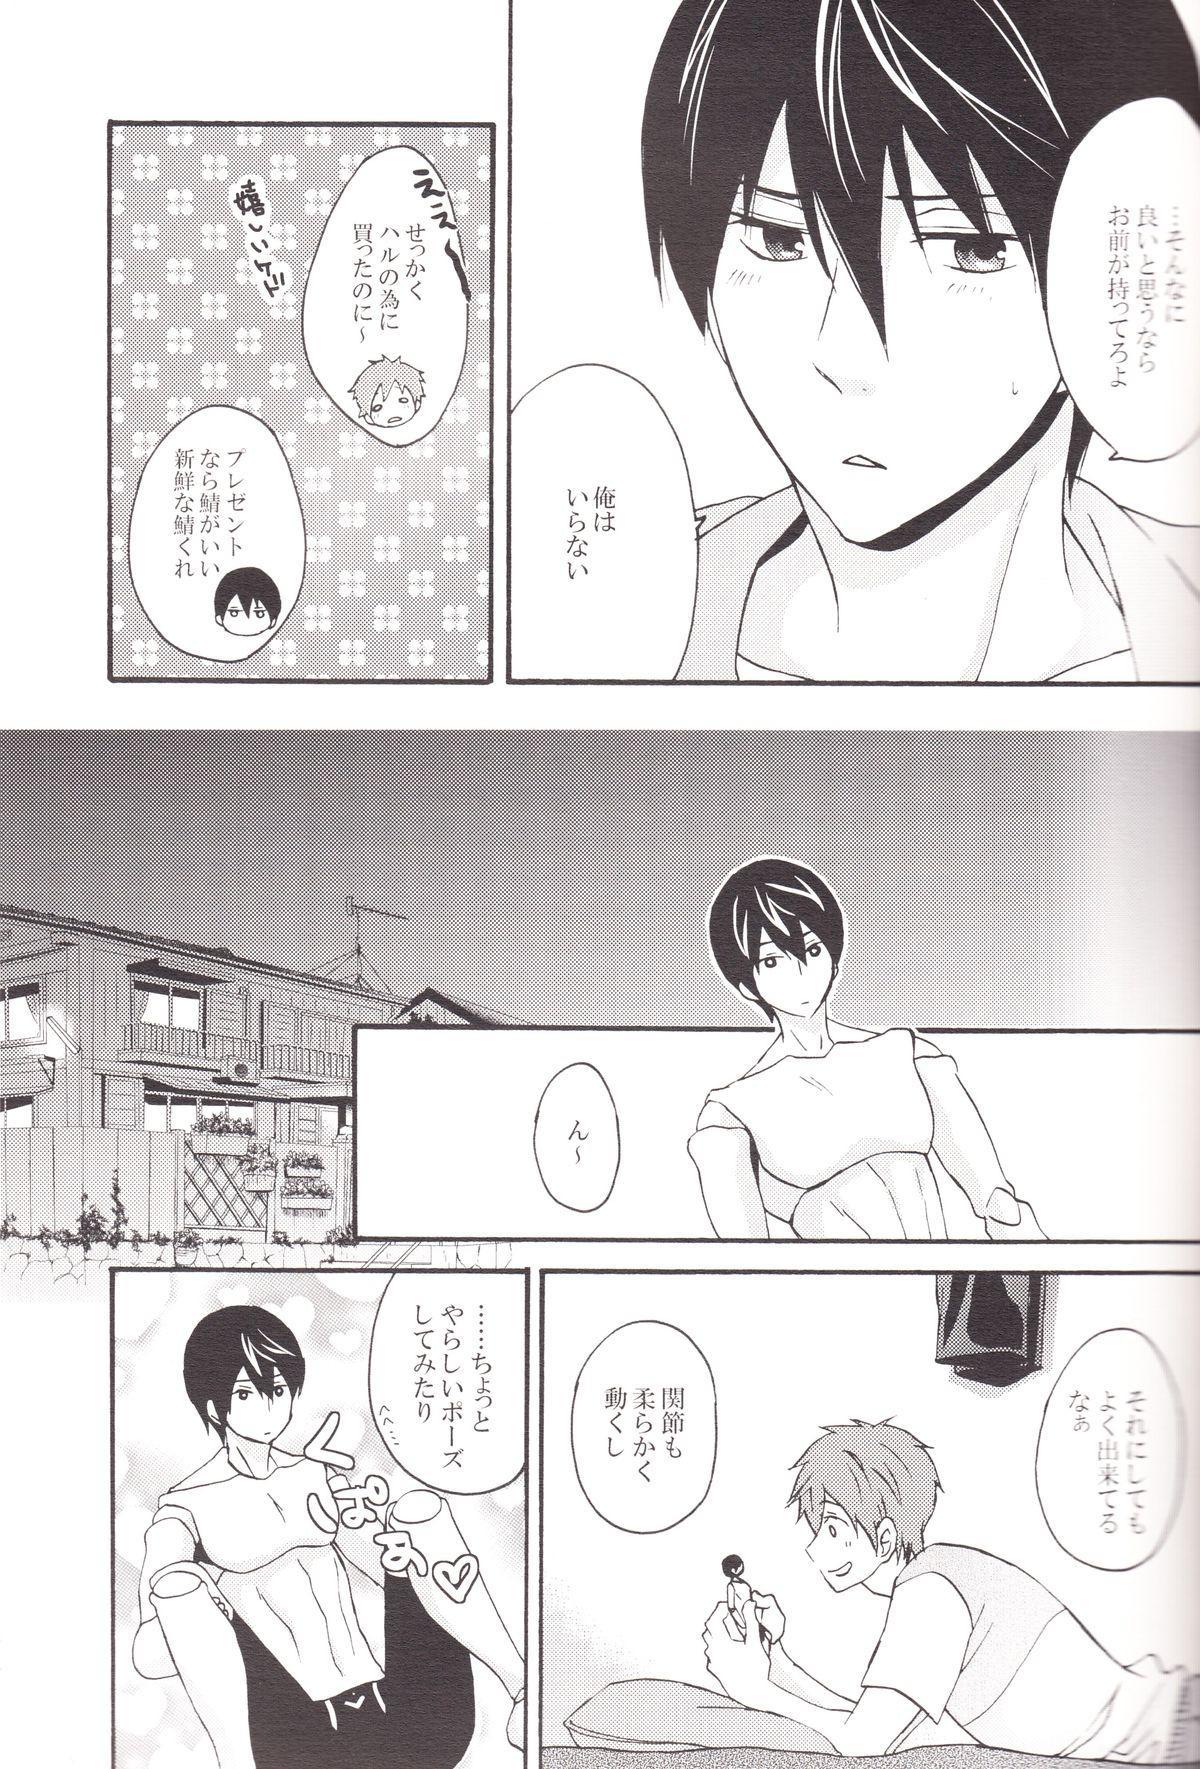 Haru-chan wo Ijitte mita 3